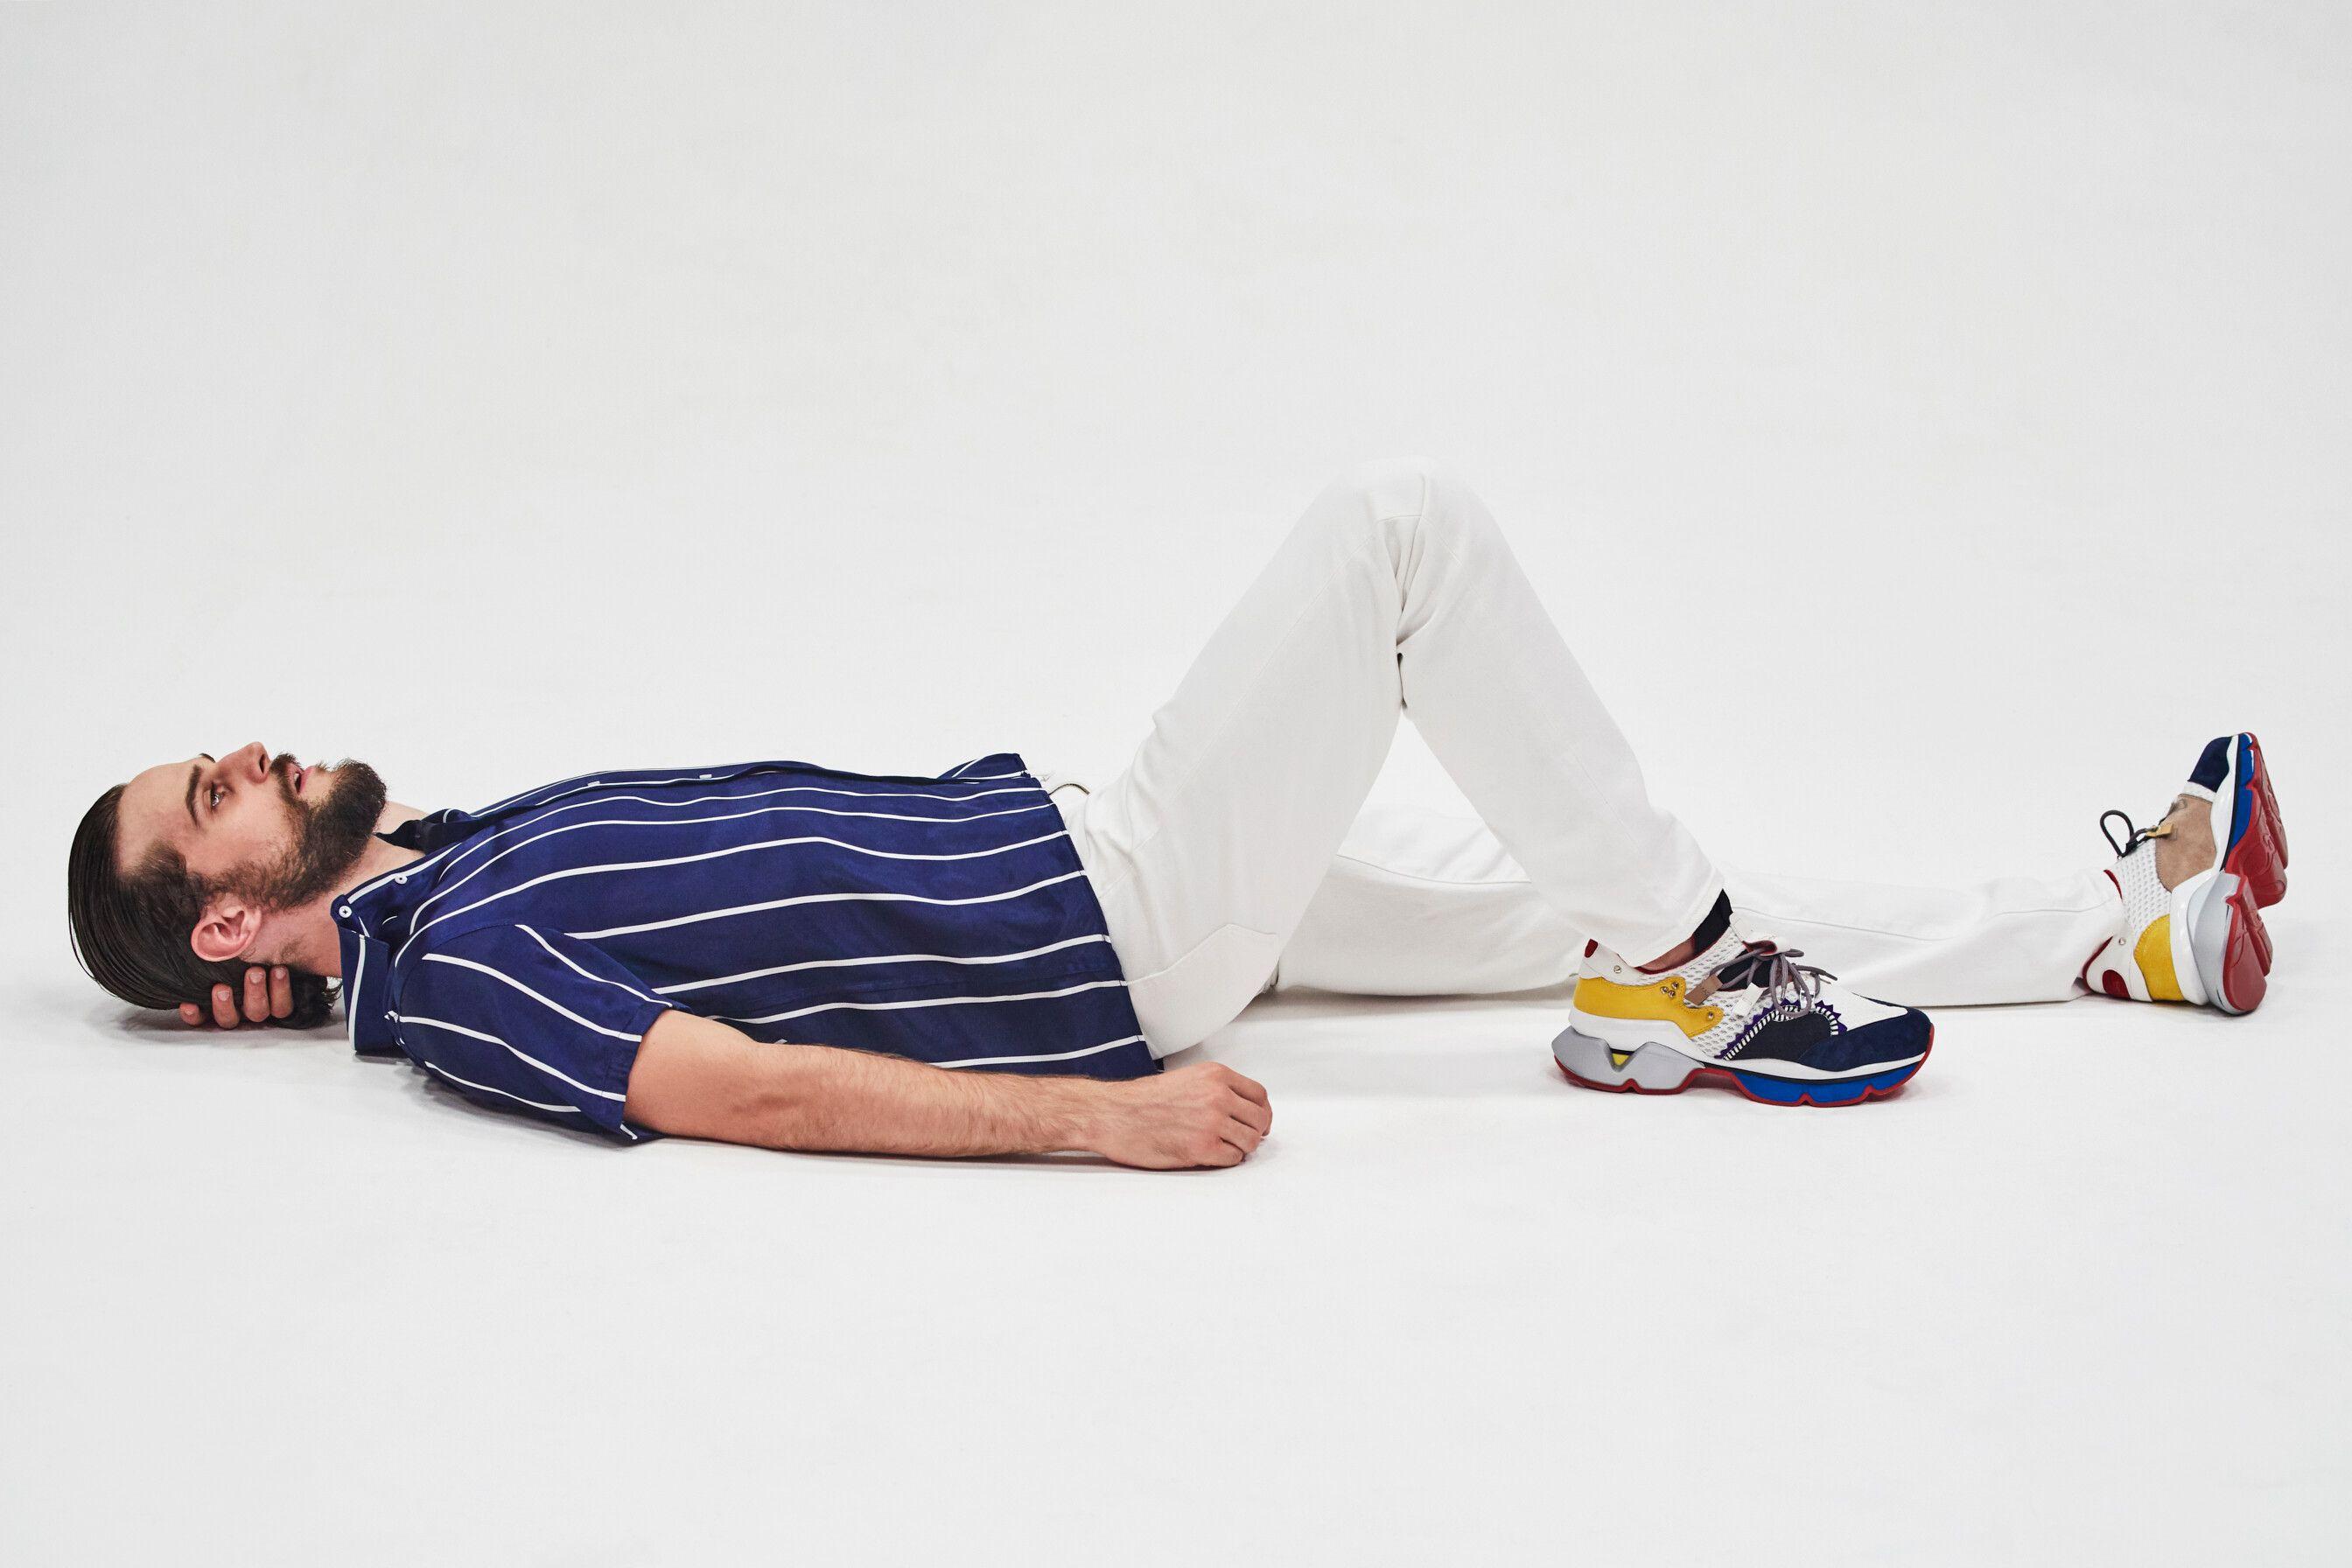 0d4cc29e5bb6 Christian Louboutin lancia le sue prime sneakers da uomo